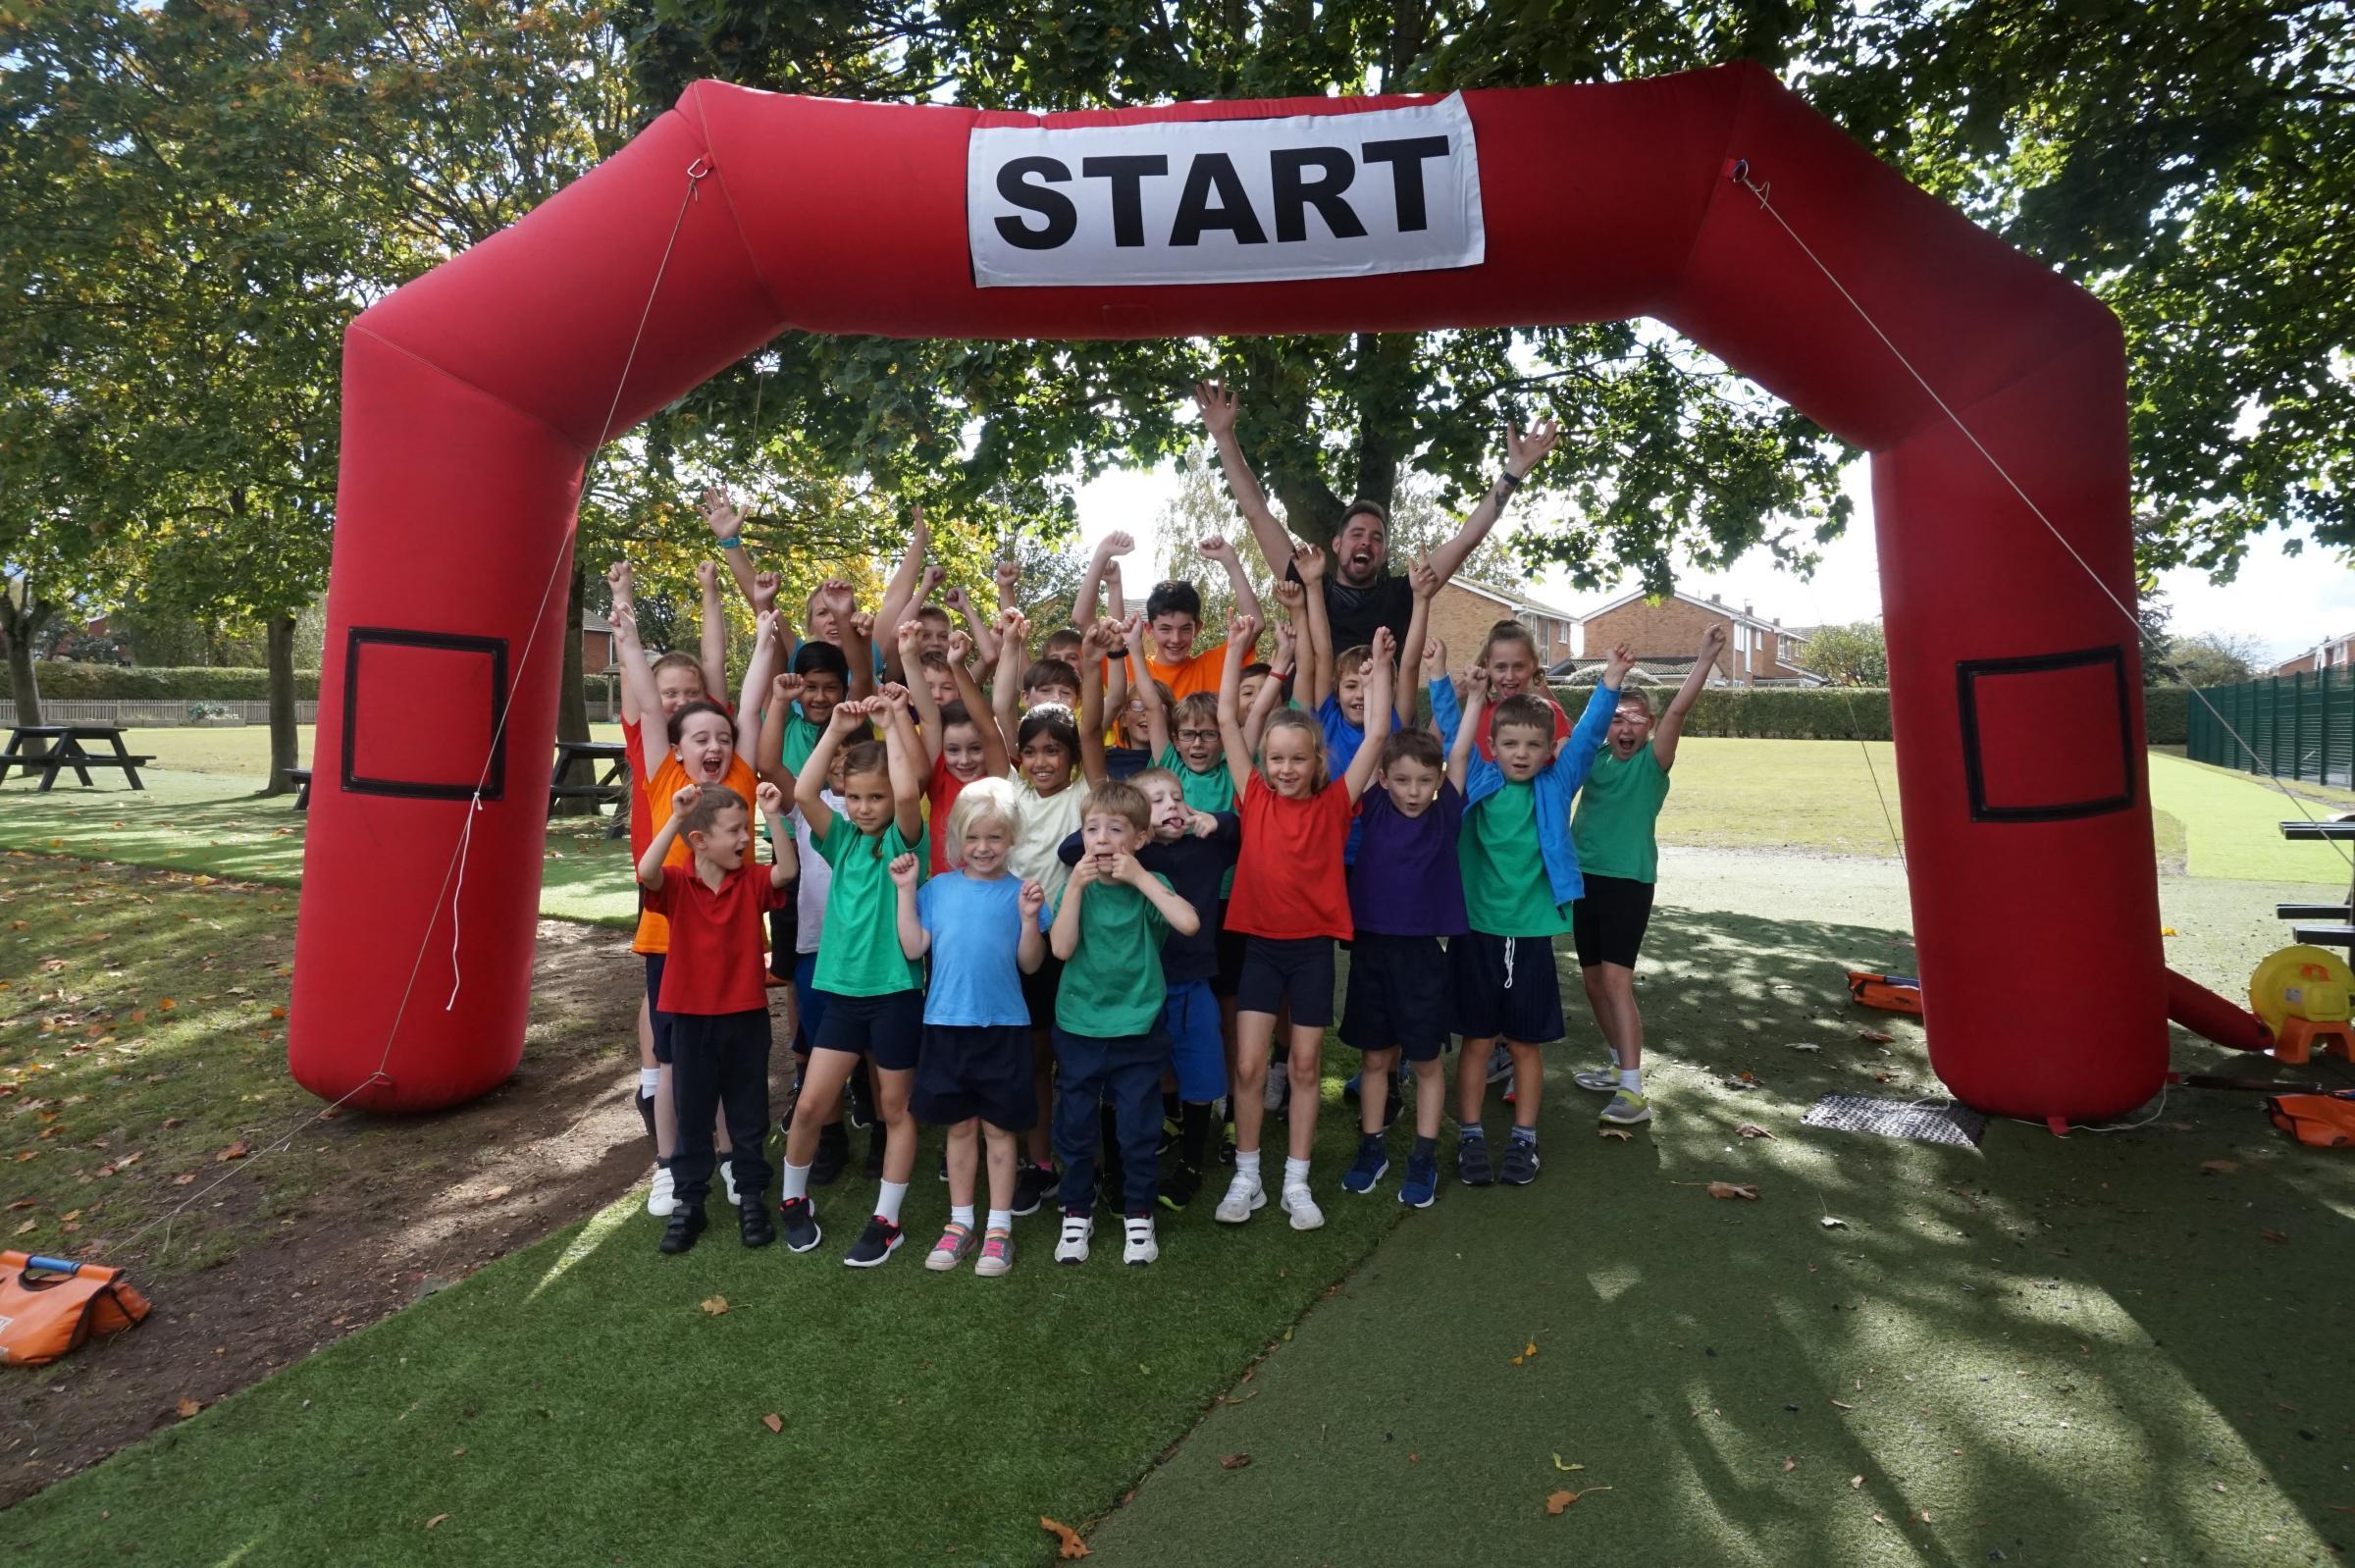 Prae Wood School in St Albans installs 200 metre running track